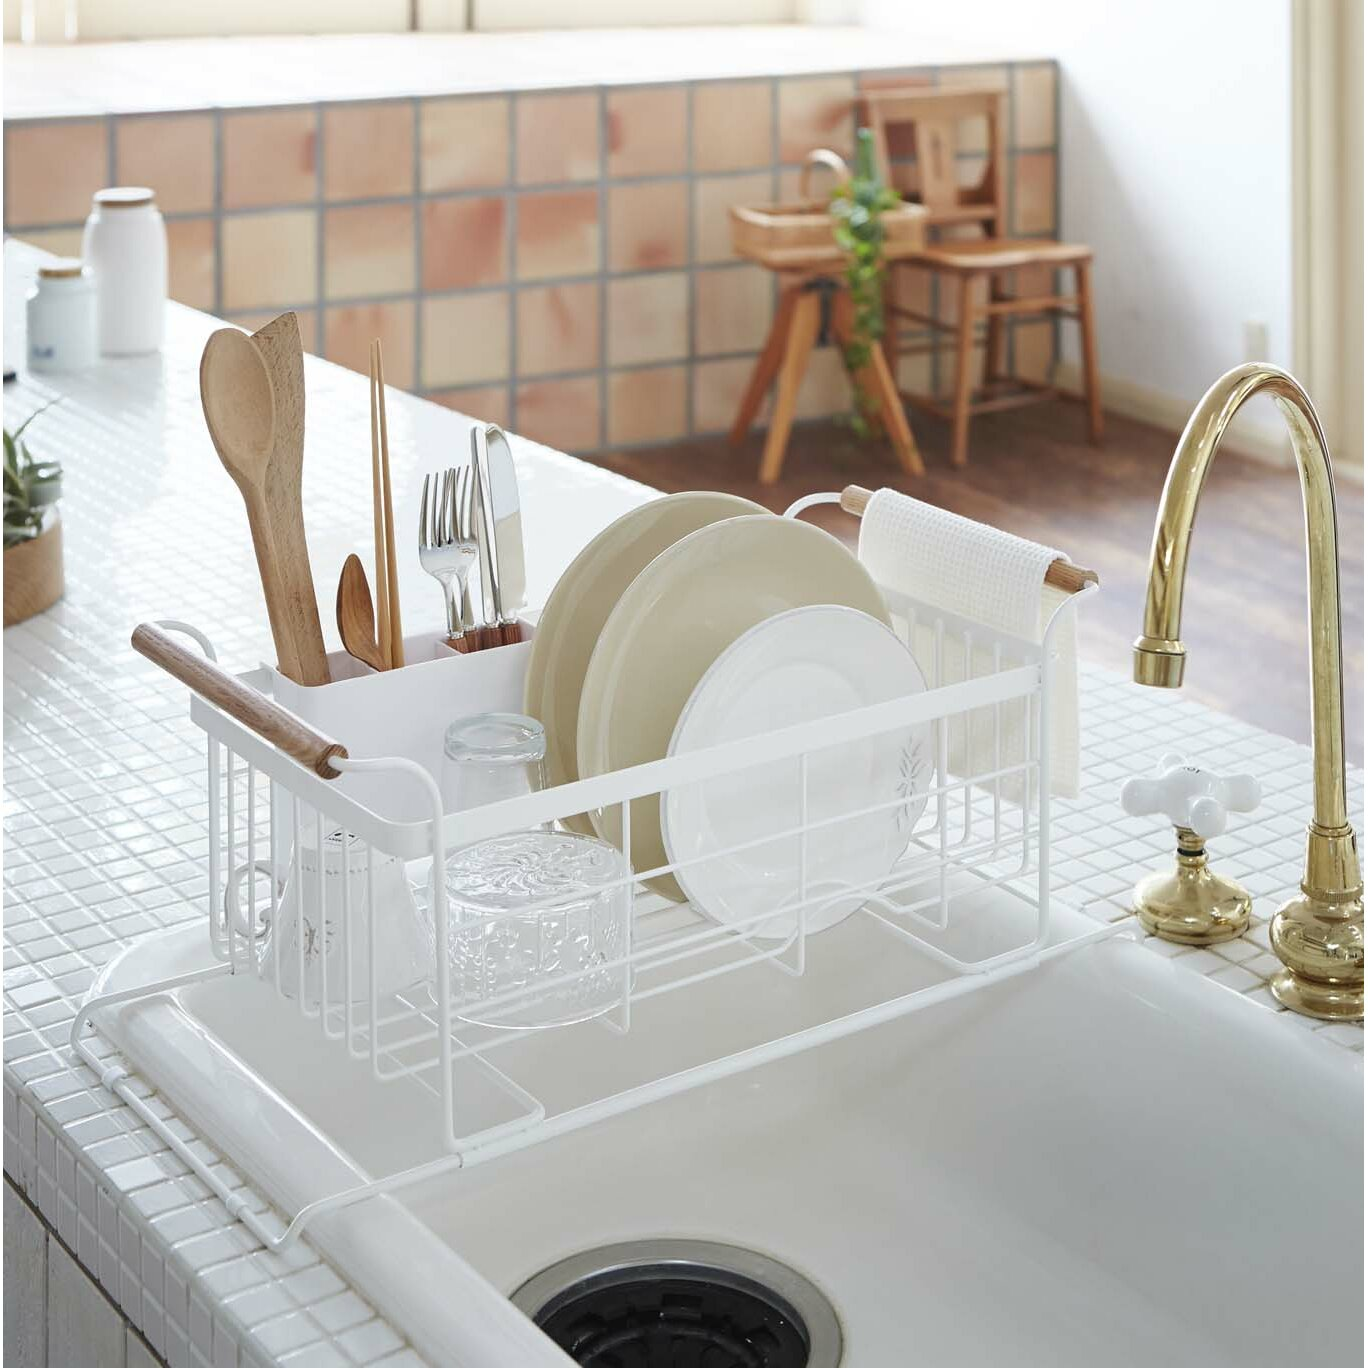 Yamazaki Usa Tosca Over The Sink Dish Drainer Rack